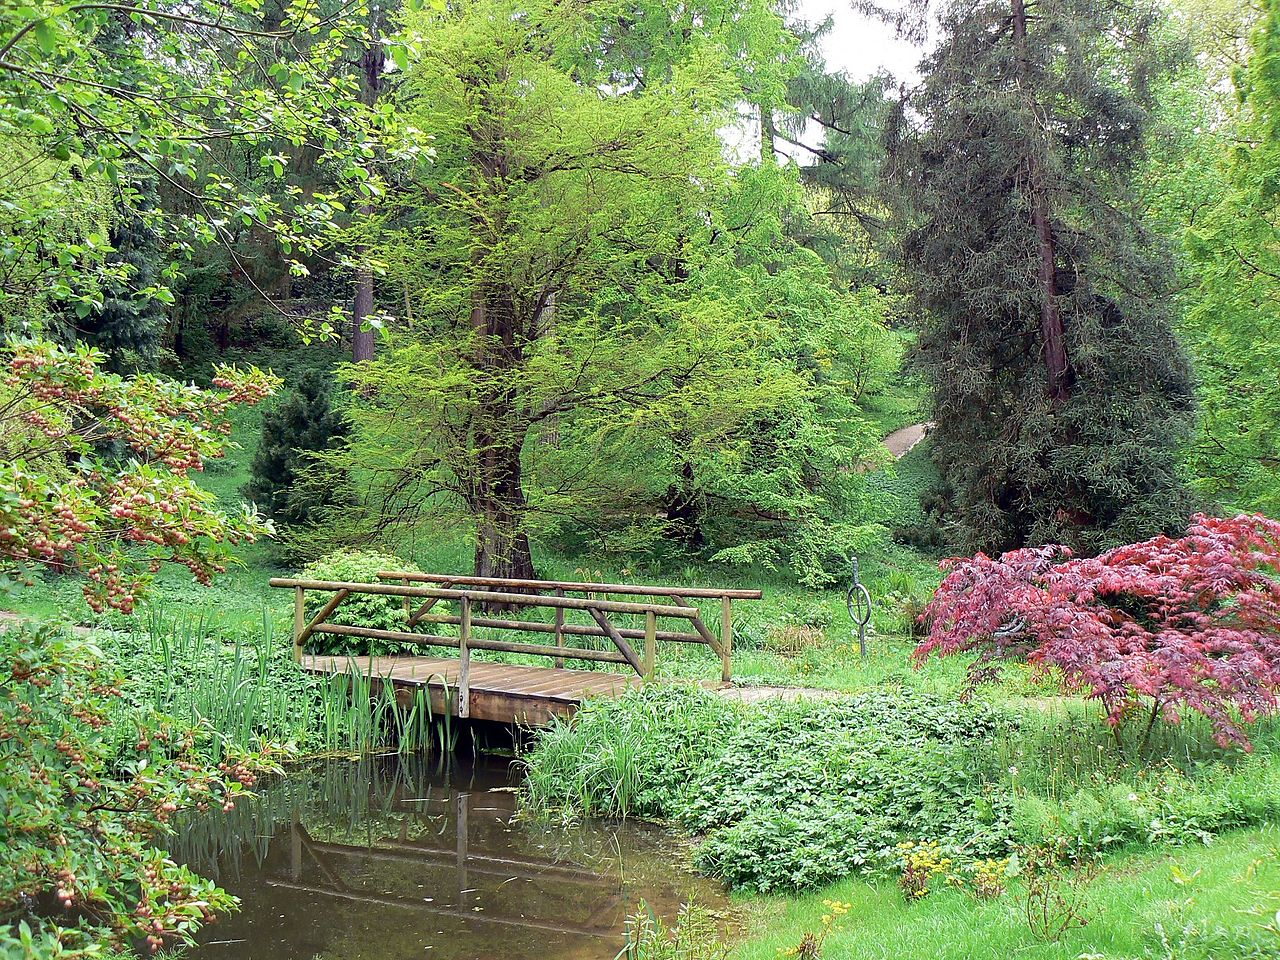 Alter Botanischer Garten Kiel: File:Alter Botanischer Garten Kiel Bruecke.jpg